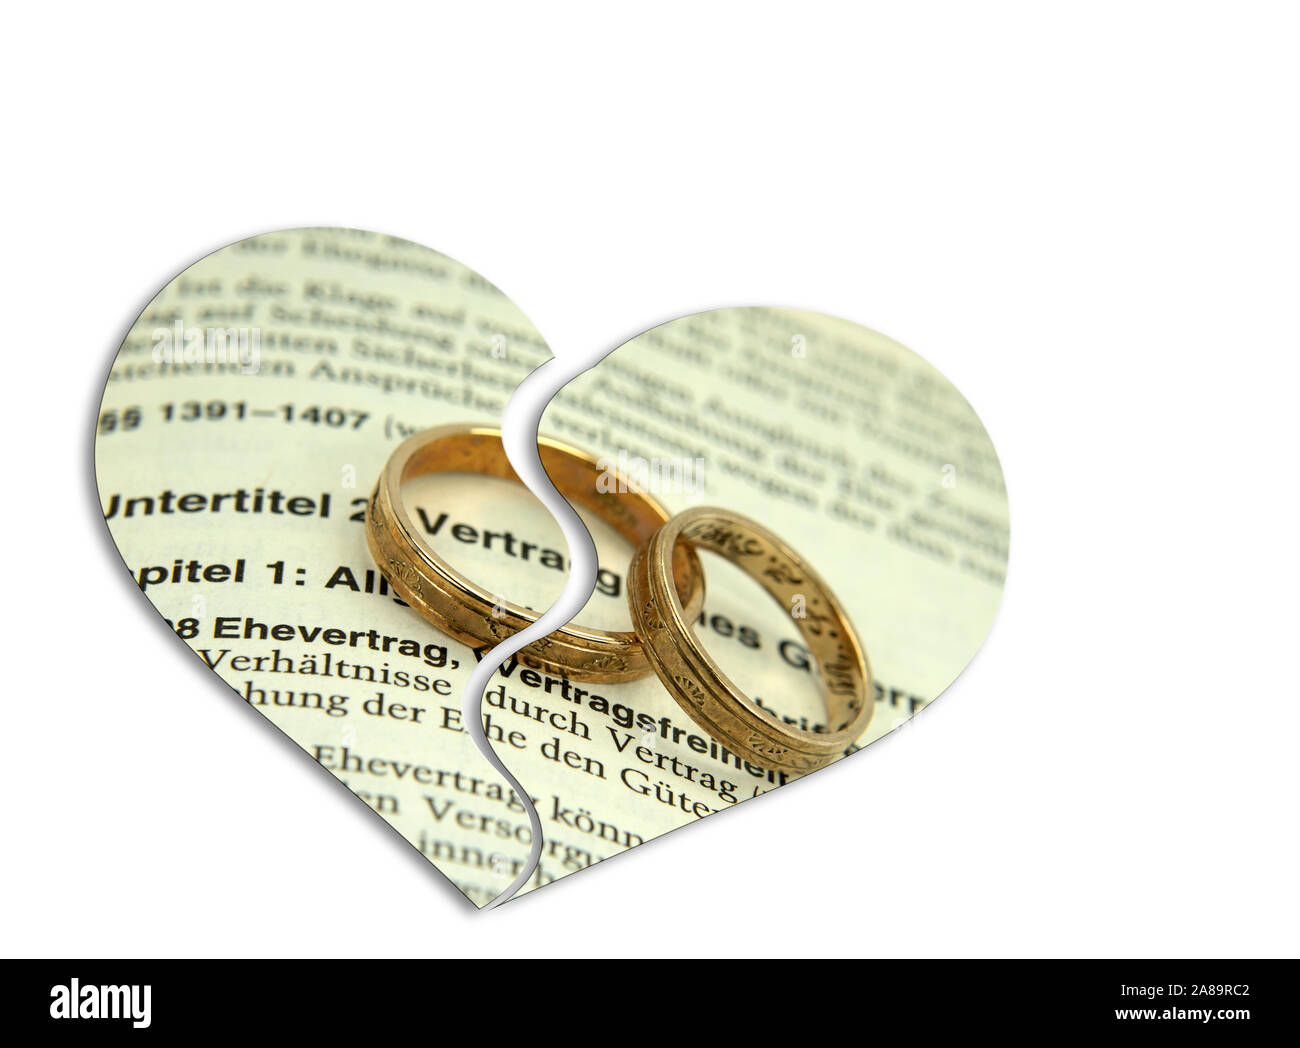 Marriage contract, divorce, symbolic representation Stock Photo